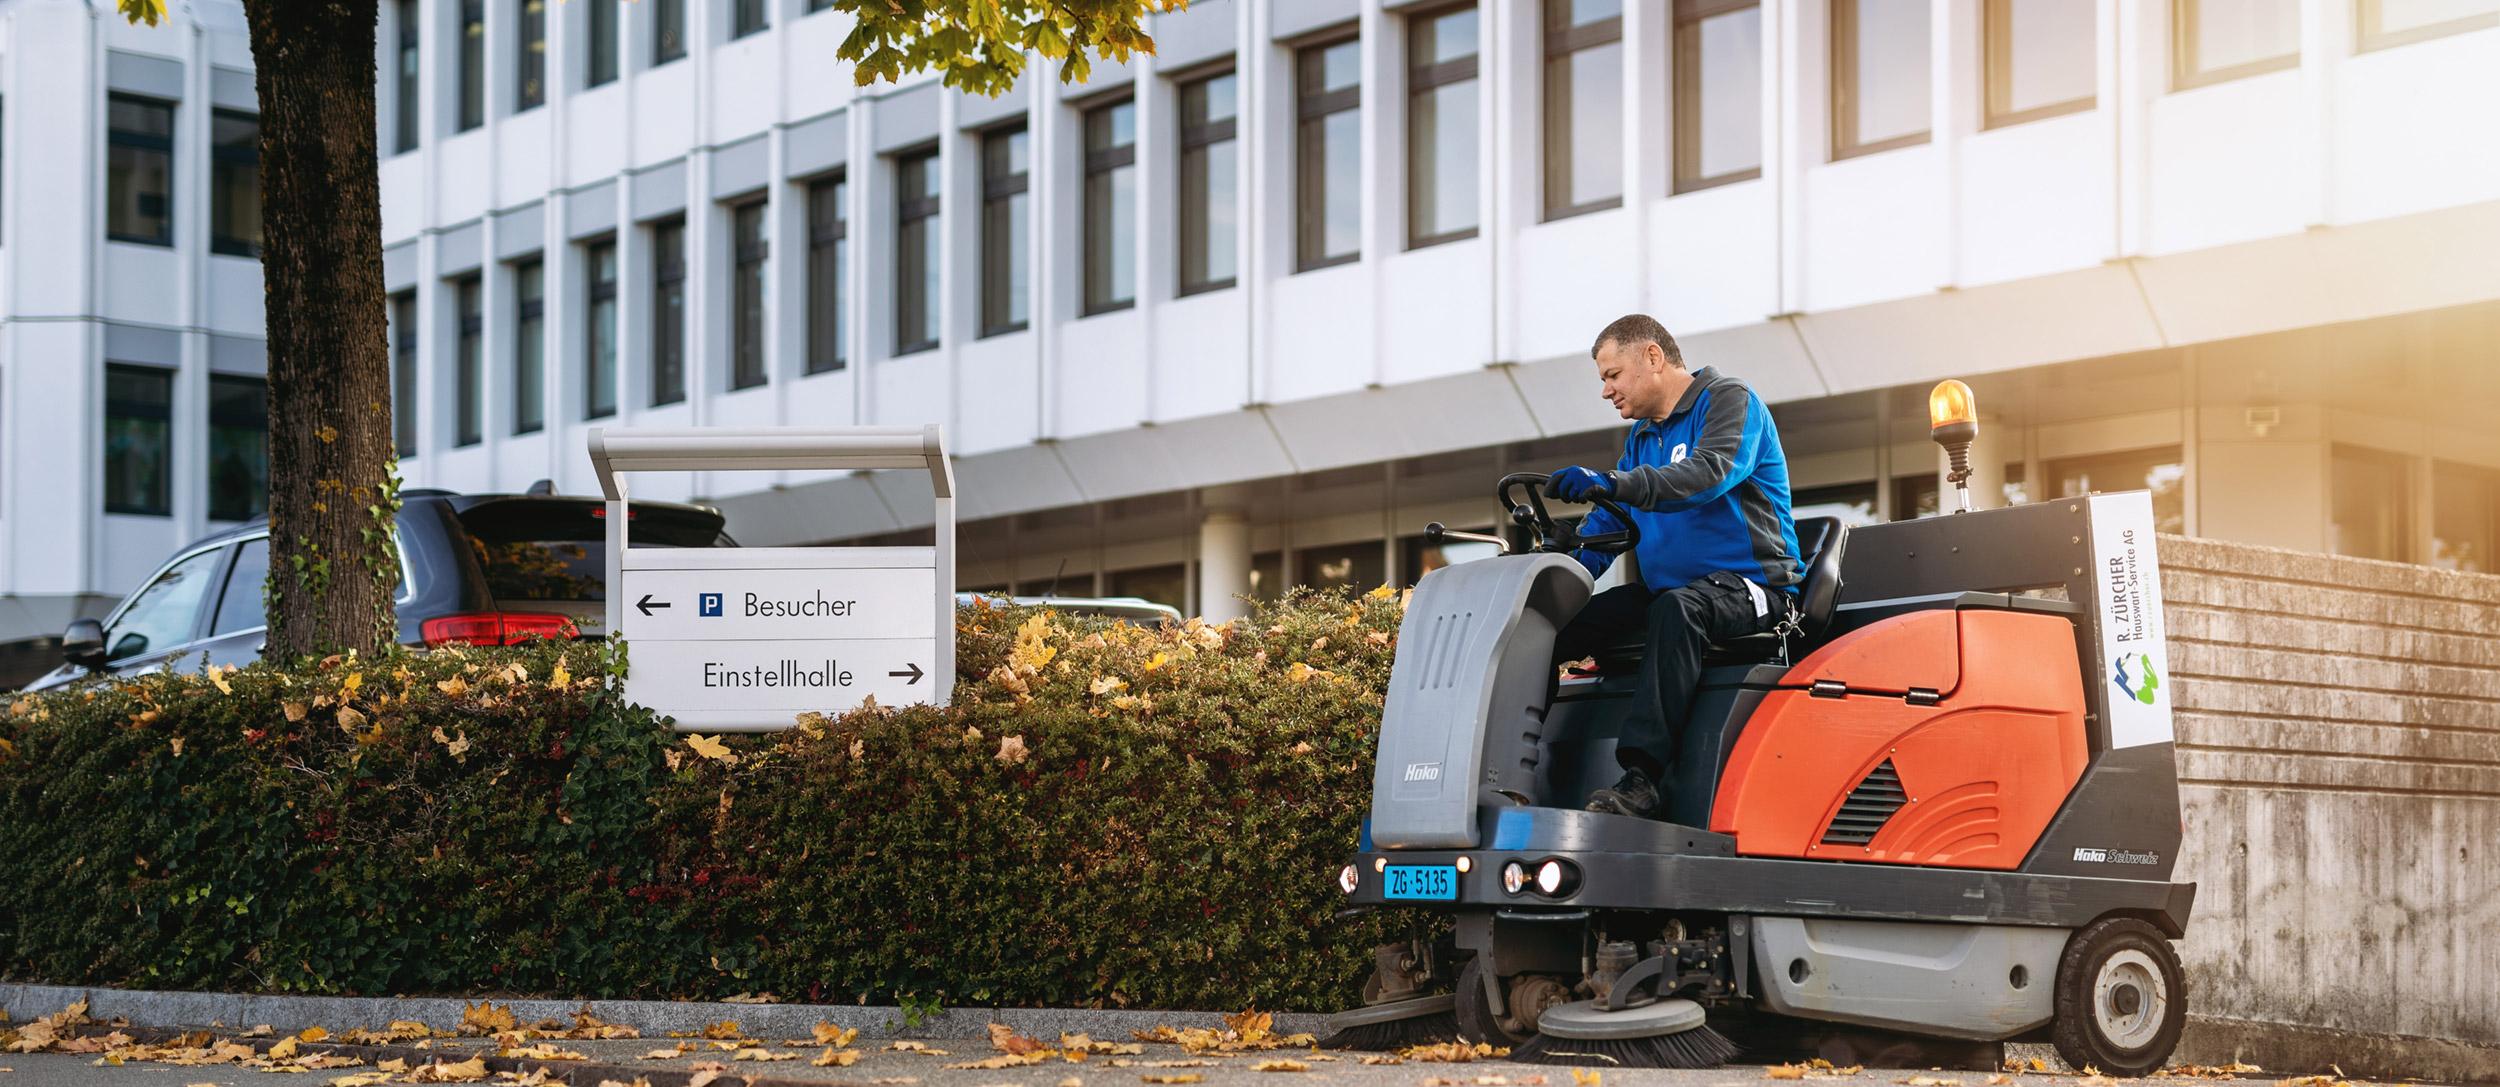 R. Zürcher Hauswart-Service AG – Hauswartung